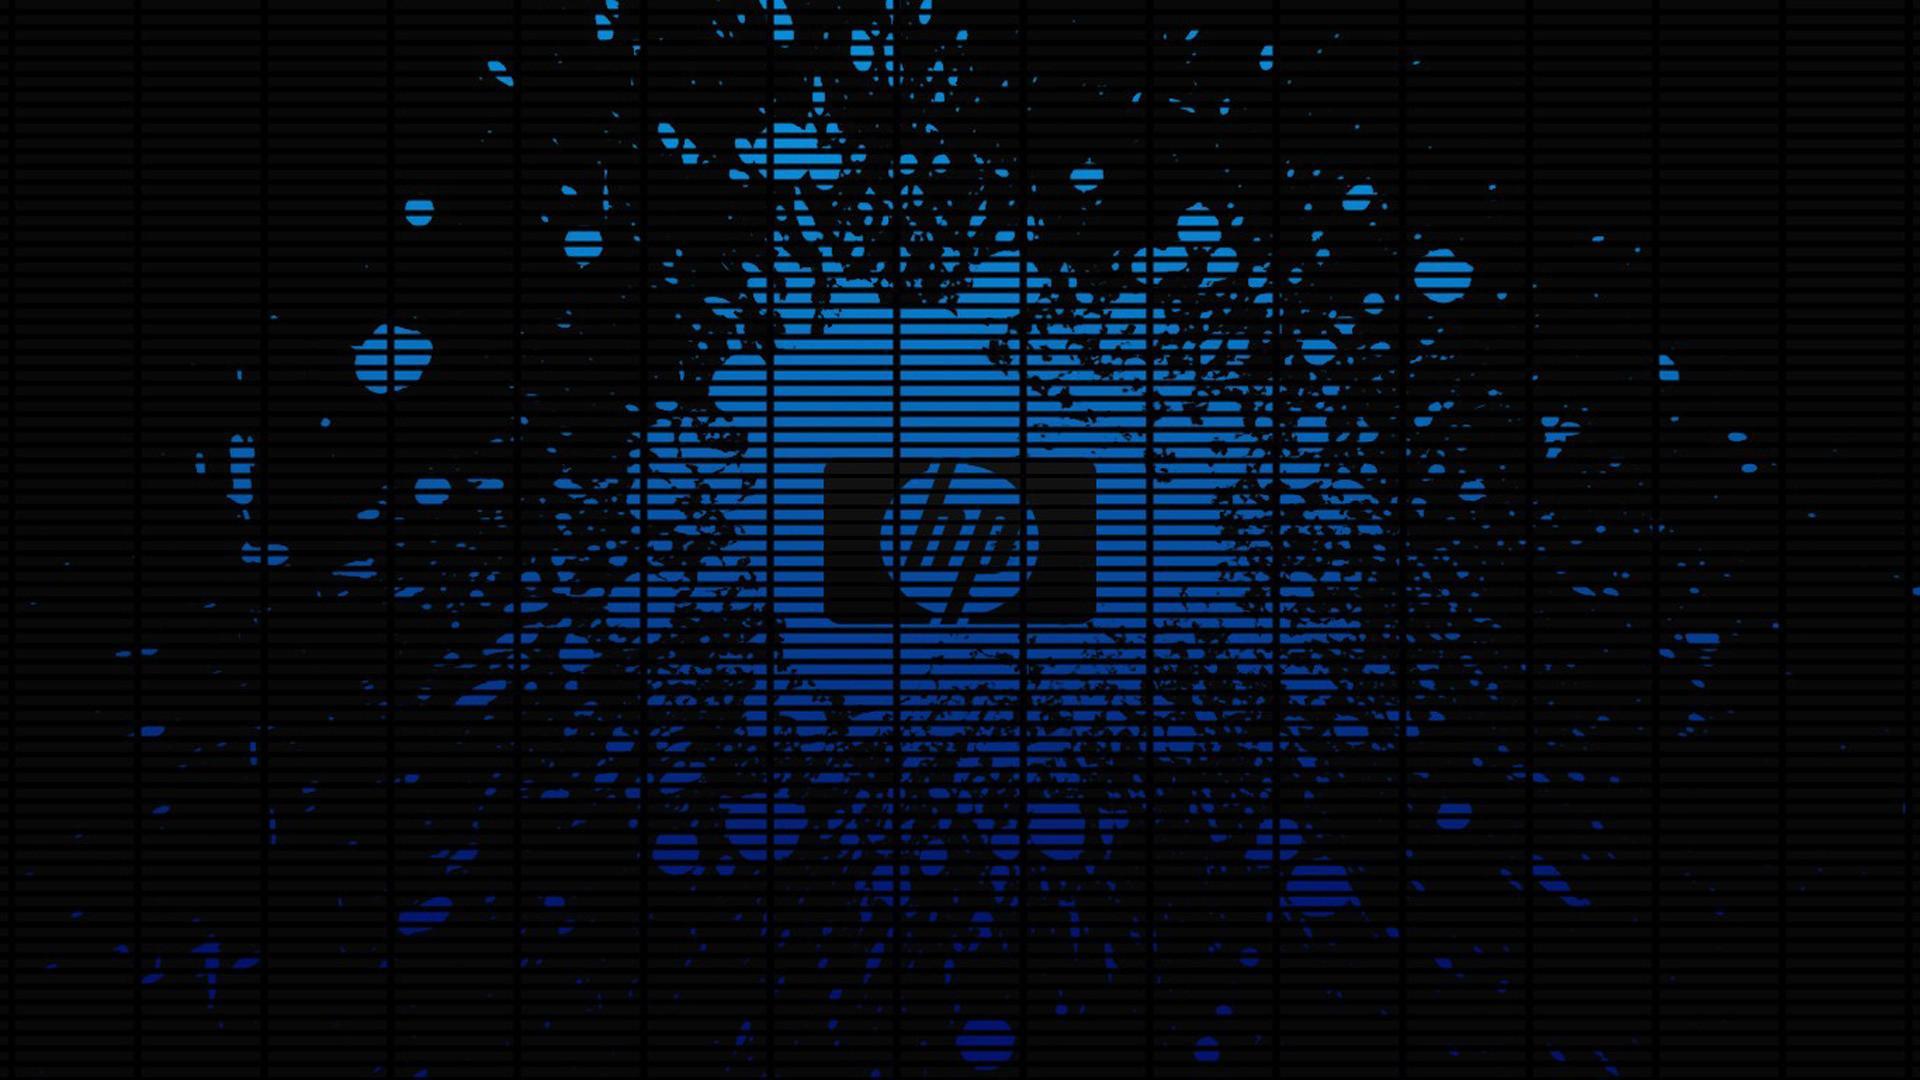 1920x1080 backgrounds clipart clipart HP Desktop Backgrounds Windows Hp desktop background clipart ... clipart